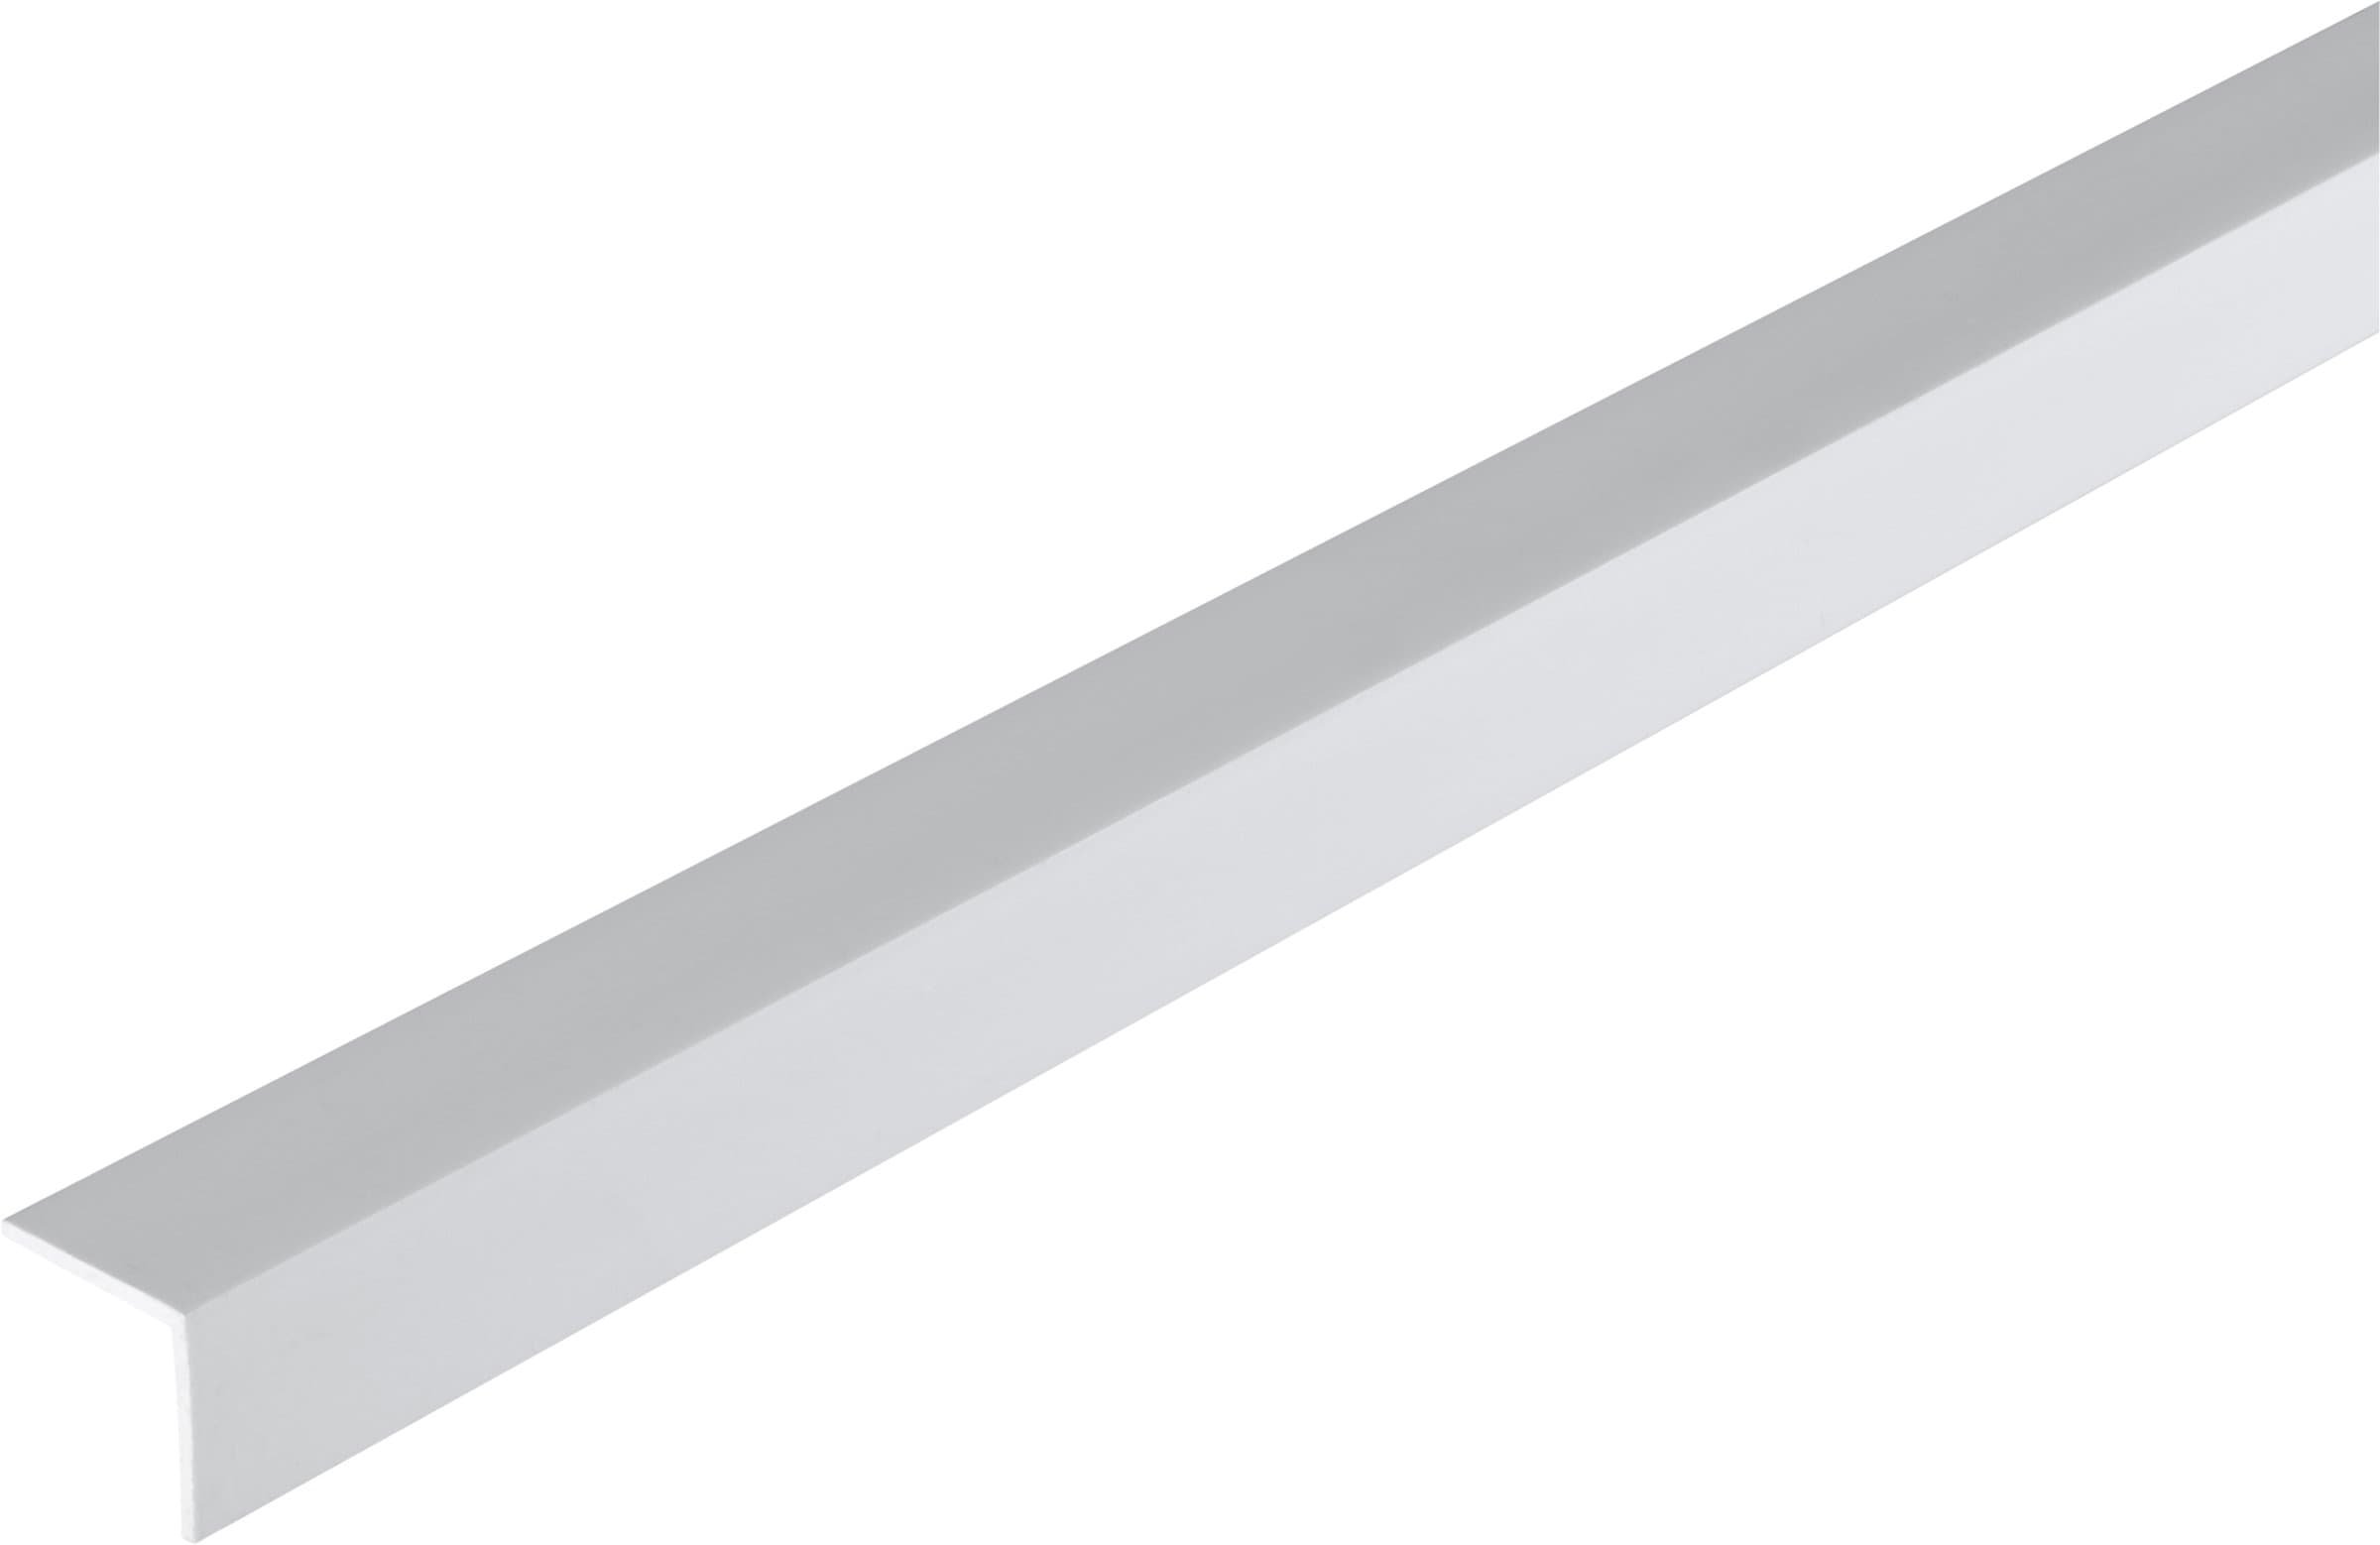 alfer Angolare isoscele 15 x 15 x 1.2 PVC bianco 1 m